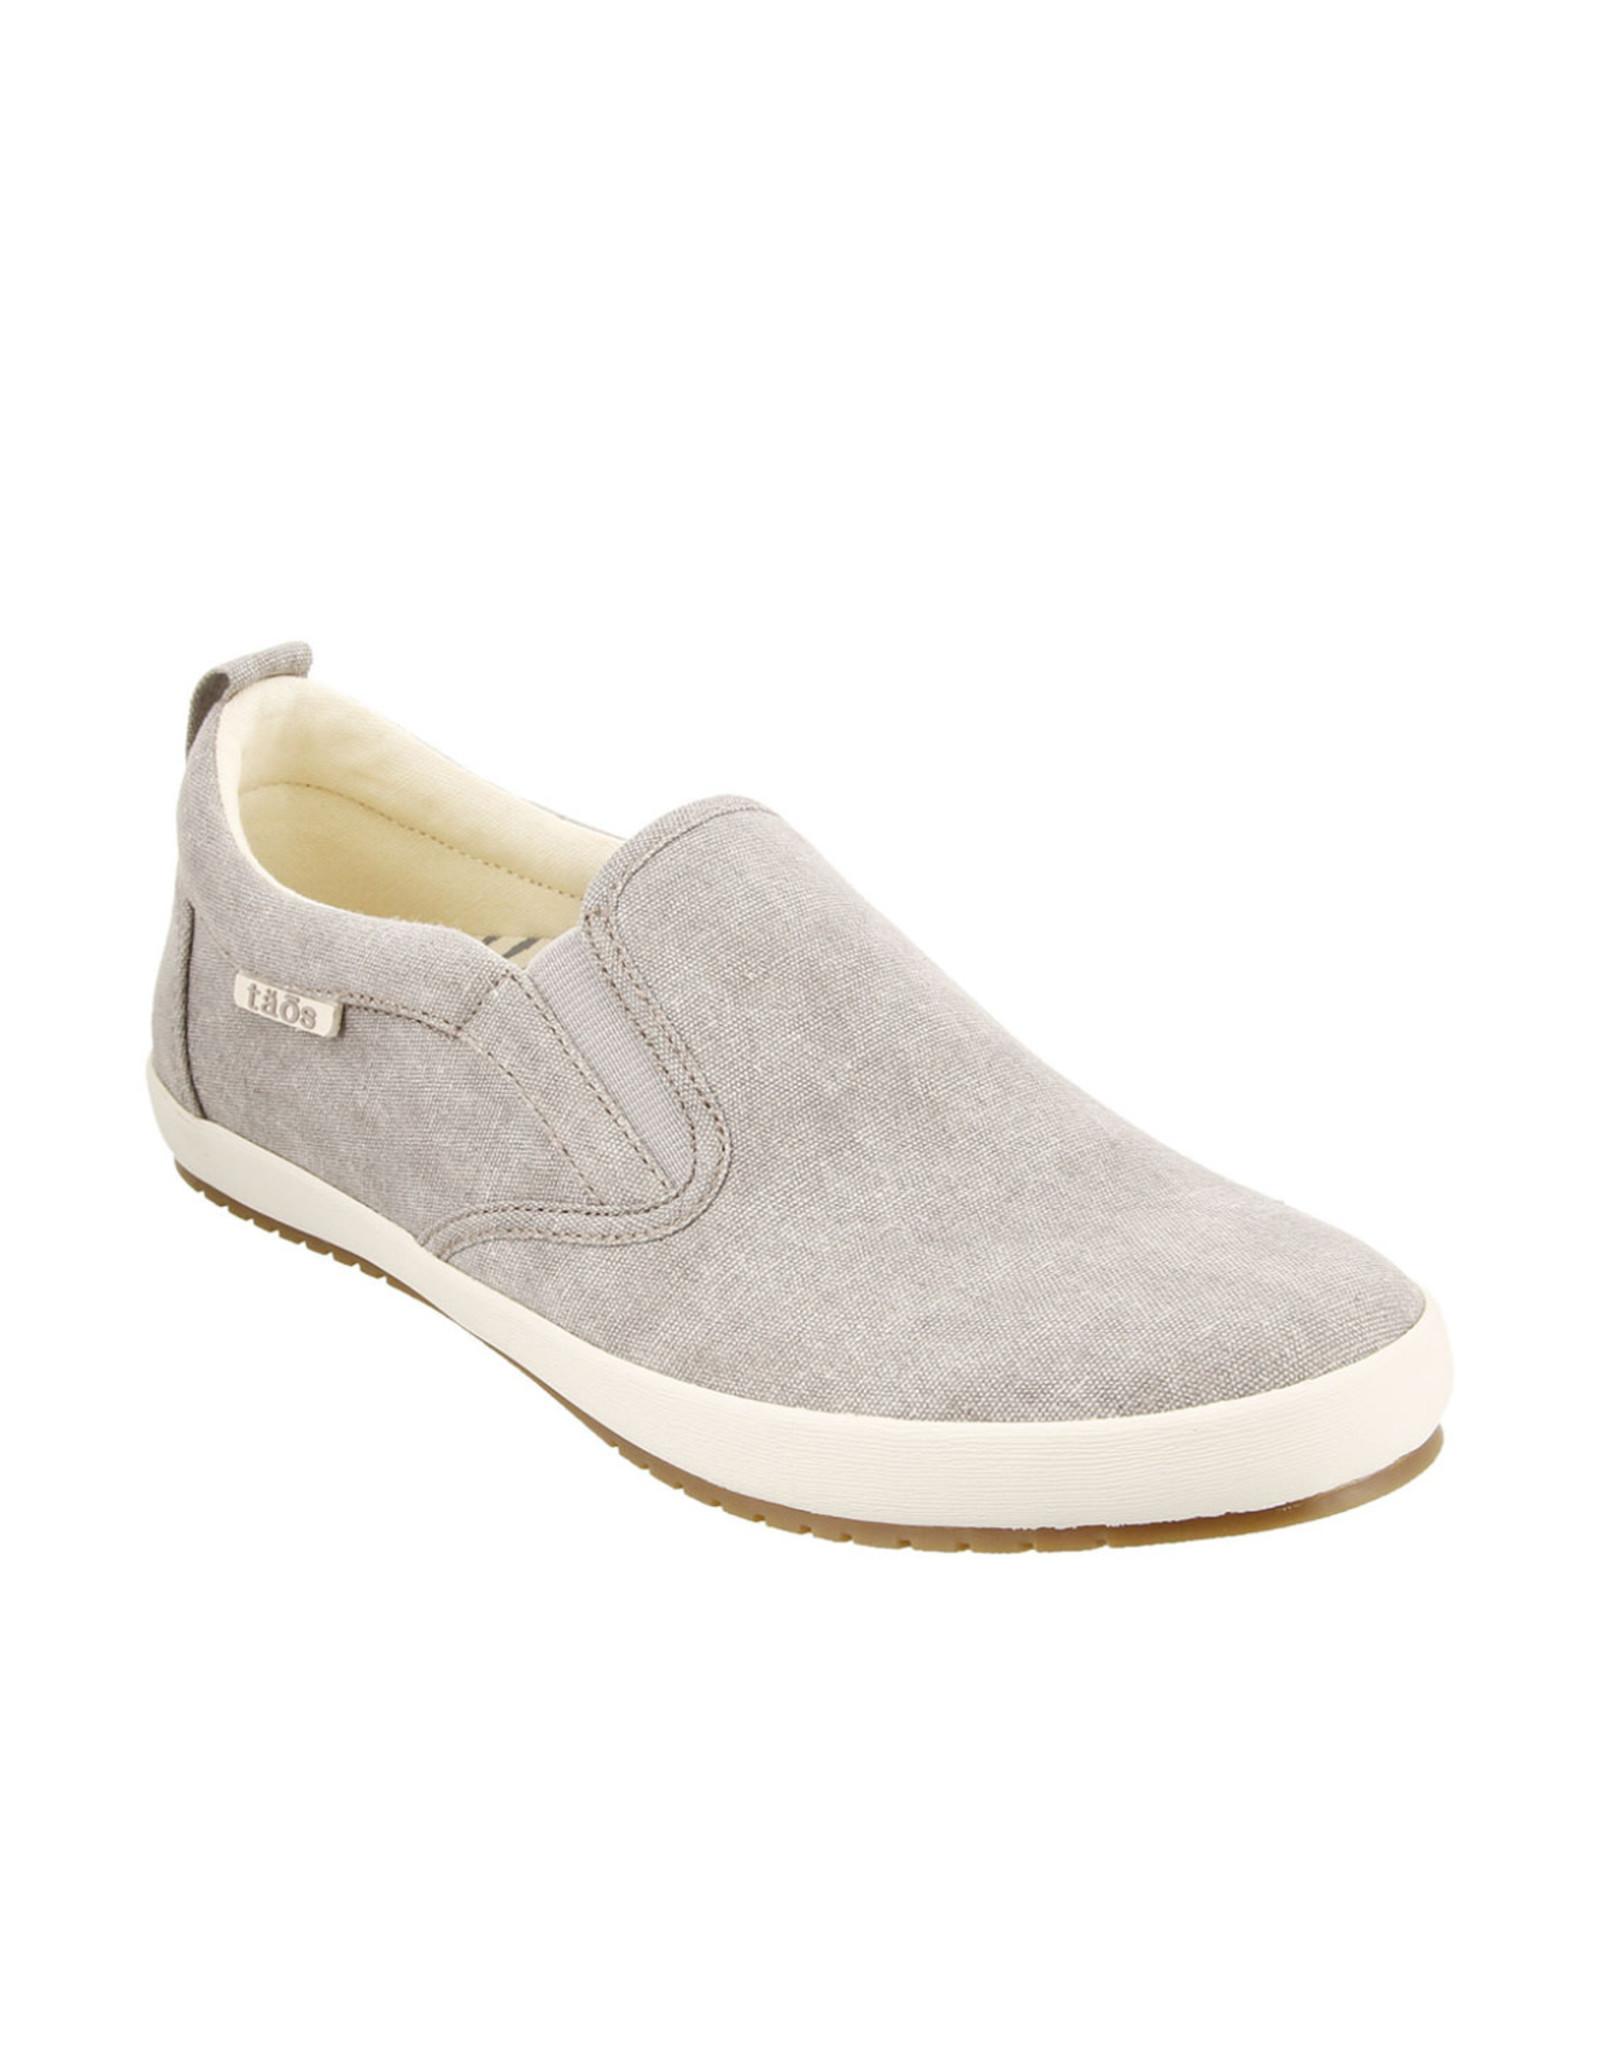 Taos Footwear Taos Dandy Canvas Slip On Sneaker